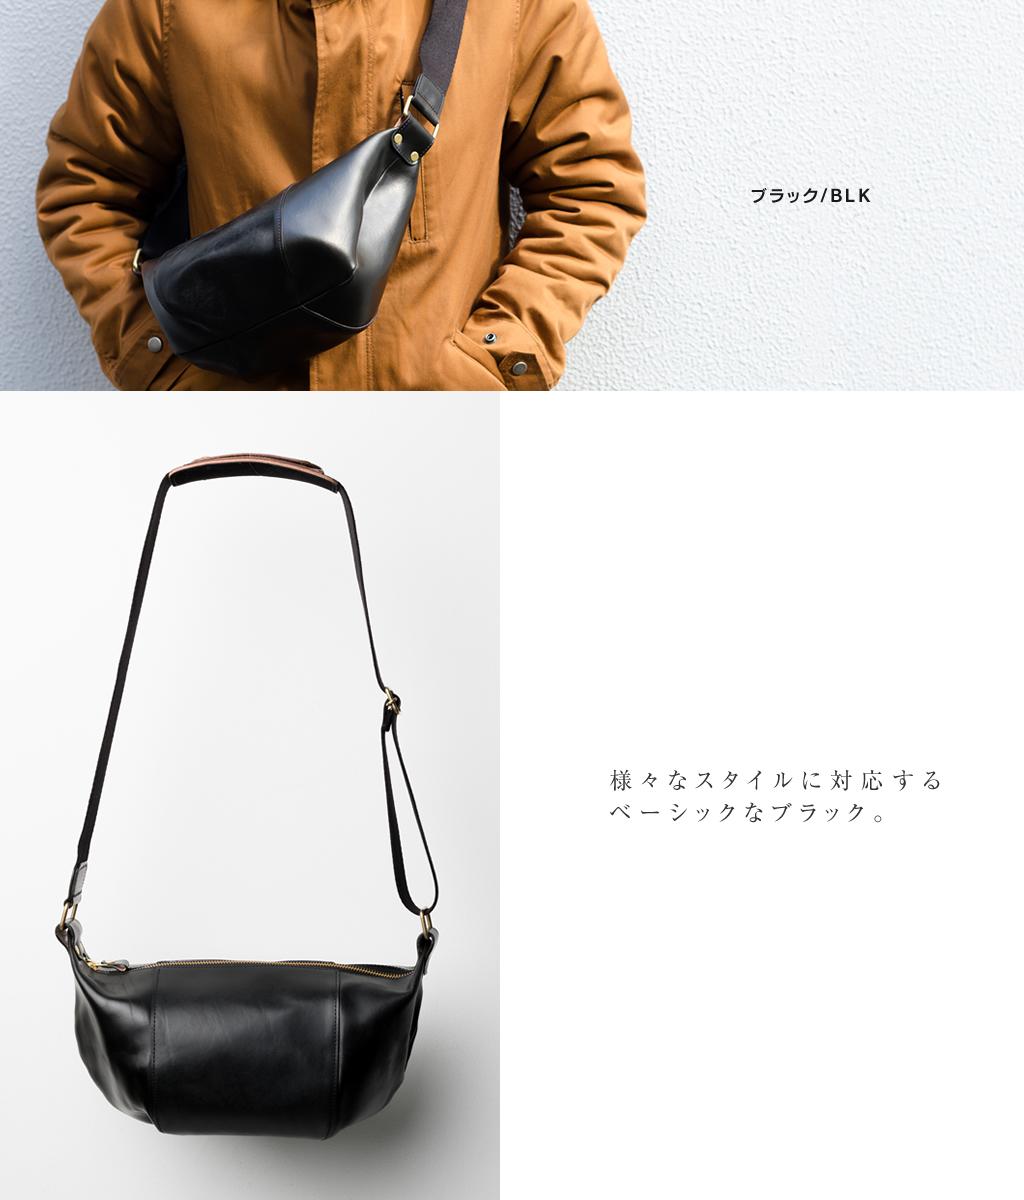 7d02887edf8f UK saddle Leather Shoulder bag and body bags men s   Shoulder bag Leather  Shoulder bag shoulder   Shoulder bag mens Leather   Shoulder bag mens  leather ...